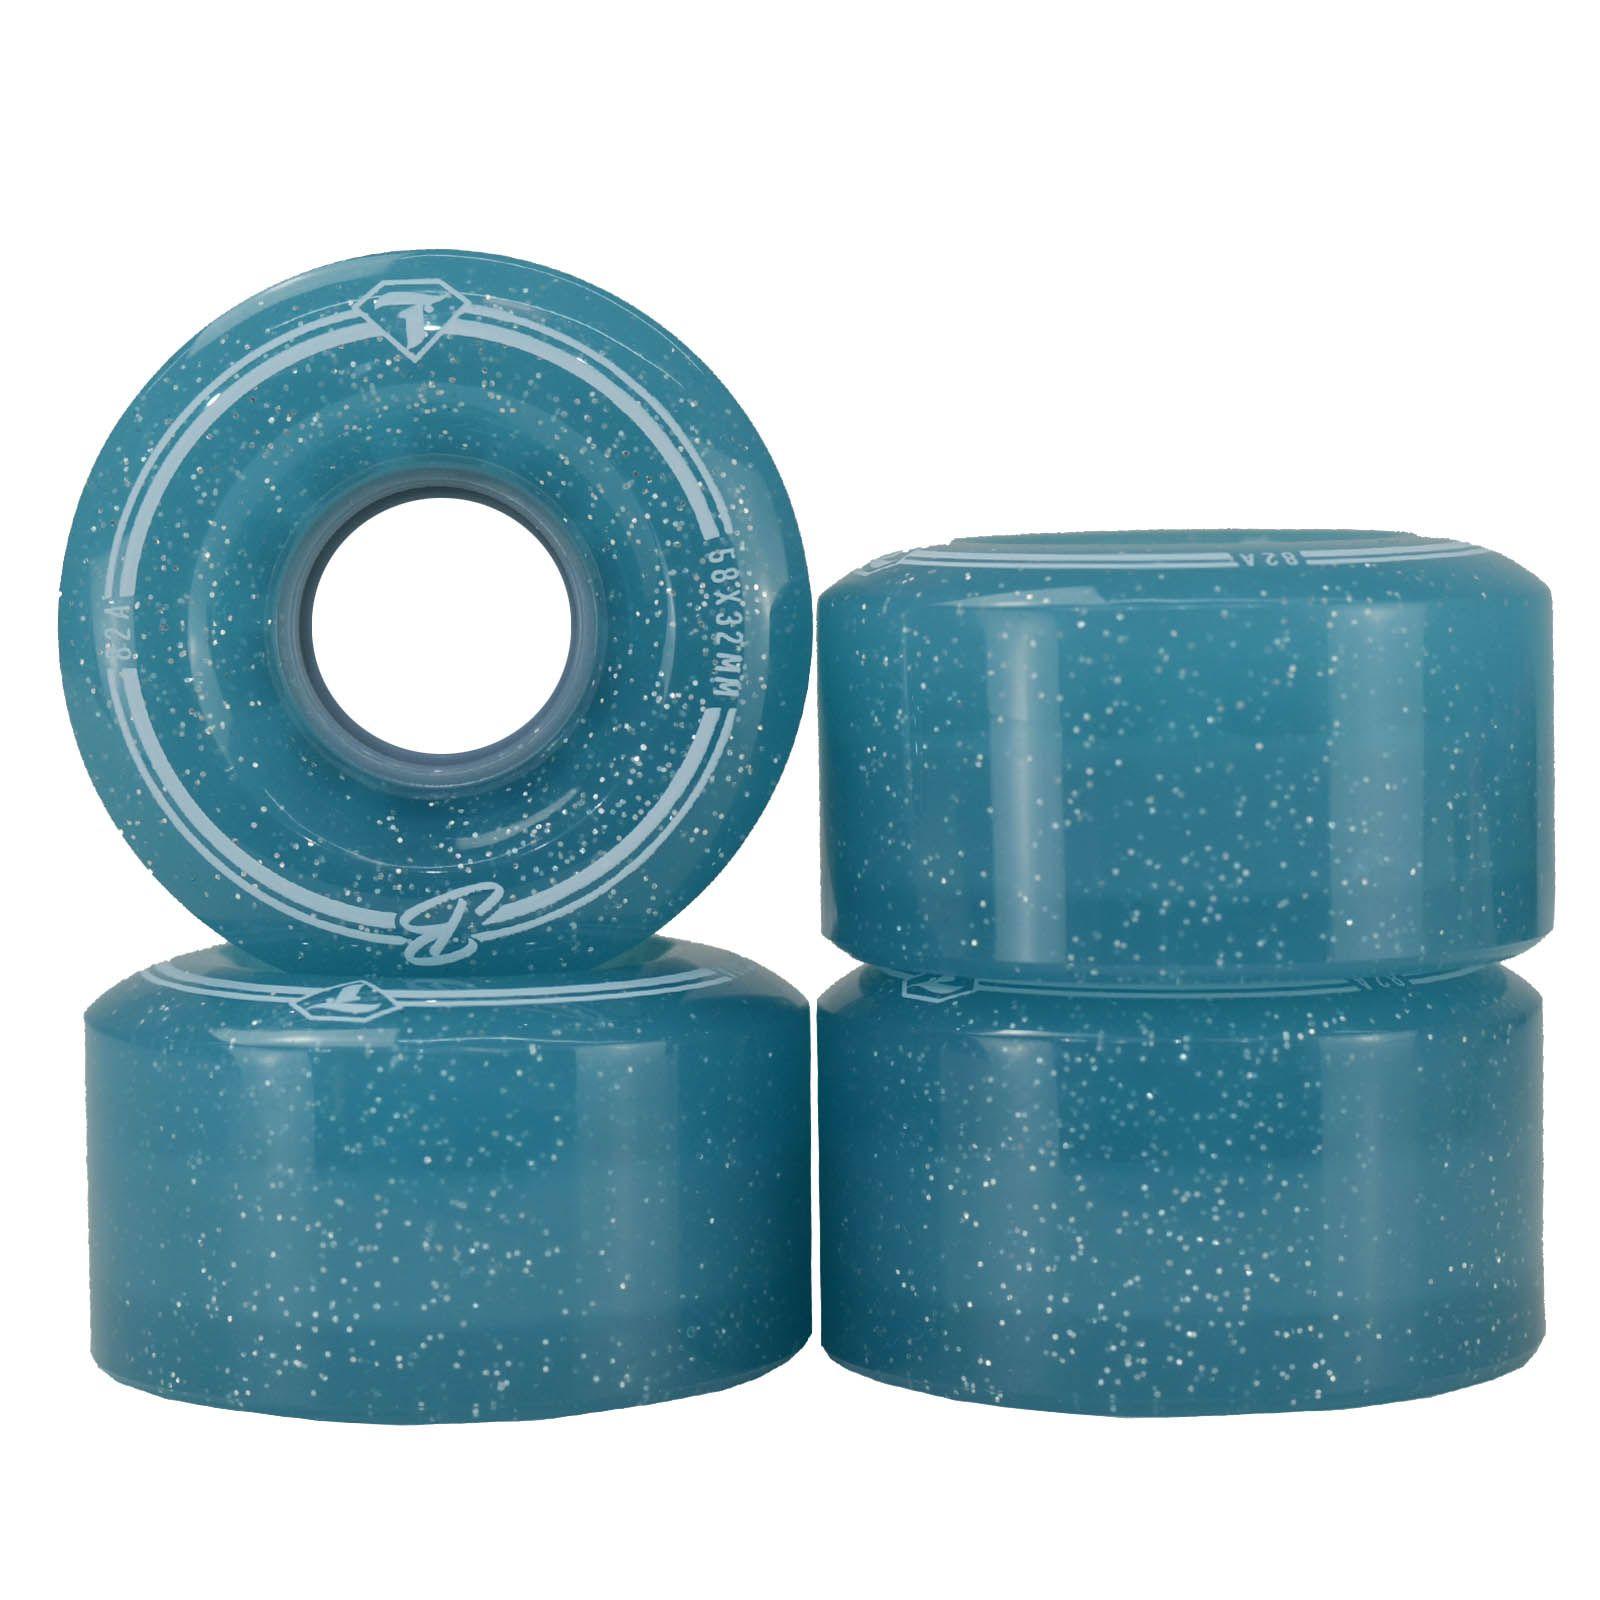 Jogo de Rodas Traxart Quad Brilliant 58x32mm/82A - Azul